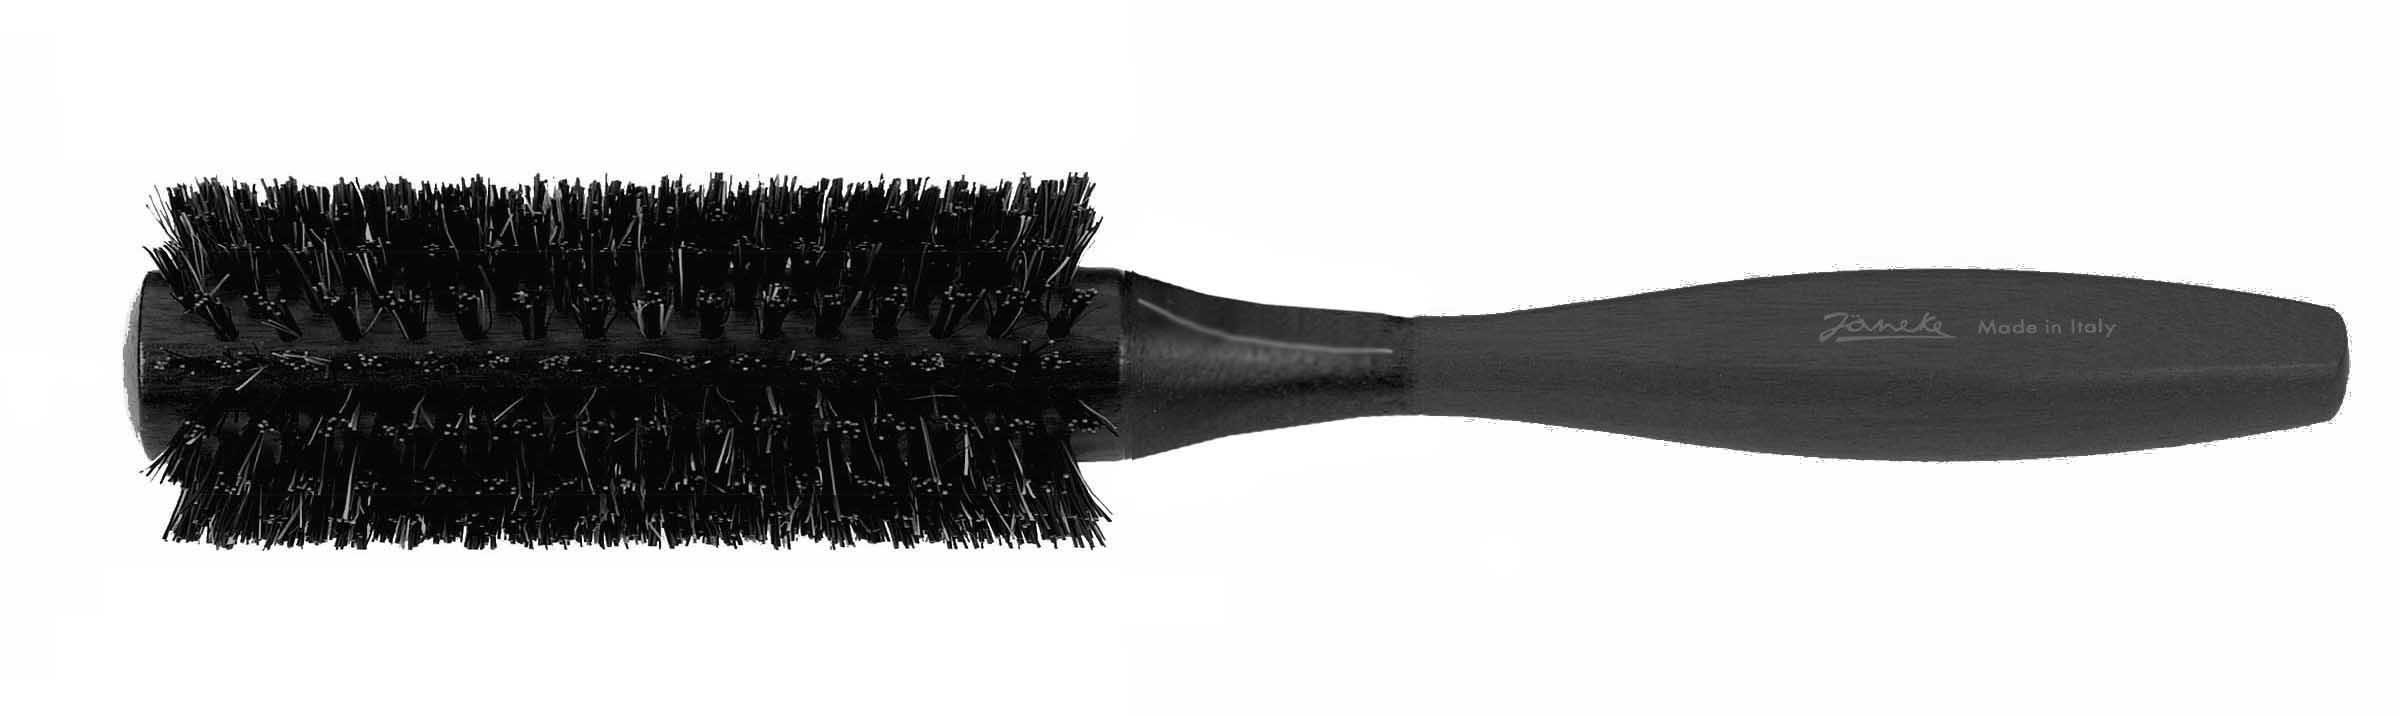 Professional round hair-brush Diameter mm 32 Cod. SP381V